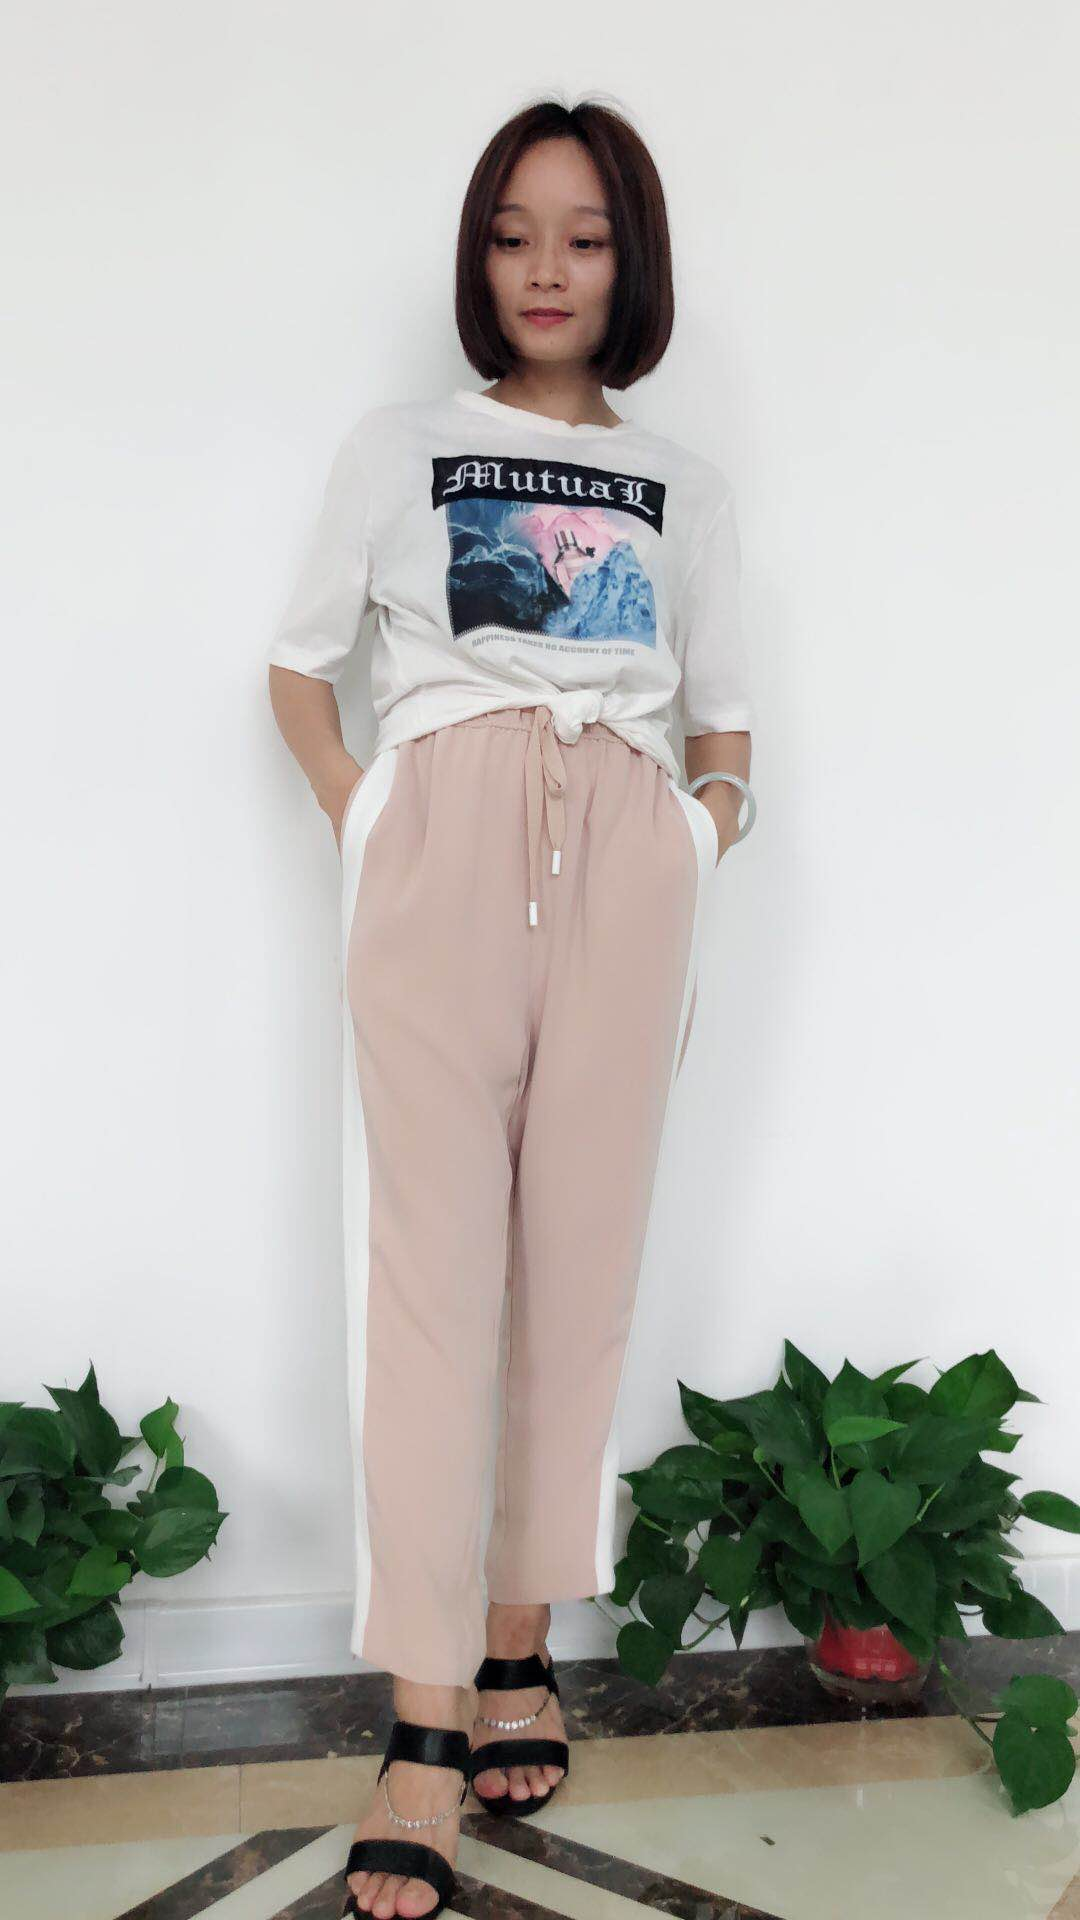 Z11夏三标齐全 时尚休闲女装 广西品牌女装库存走份折扣批发 艾薇萱